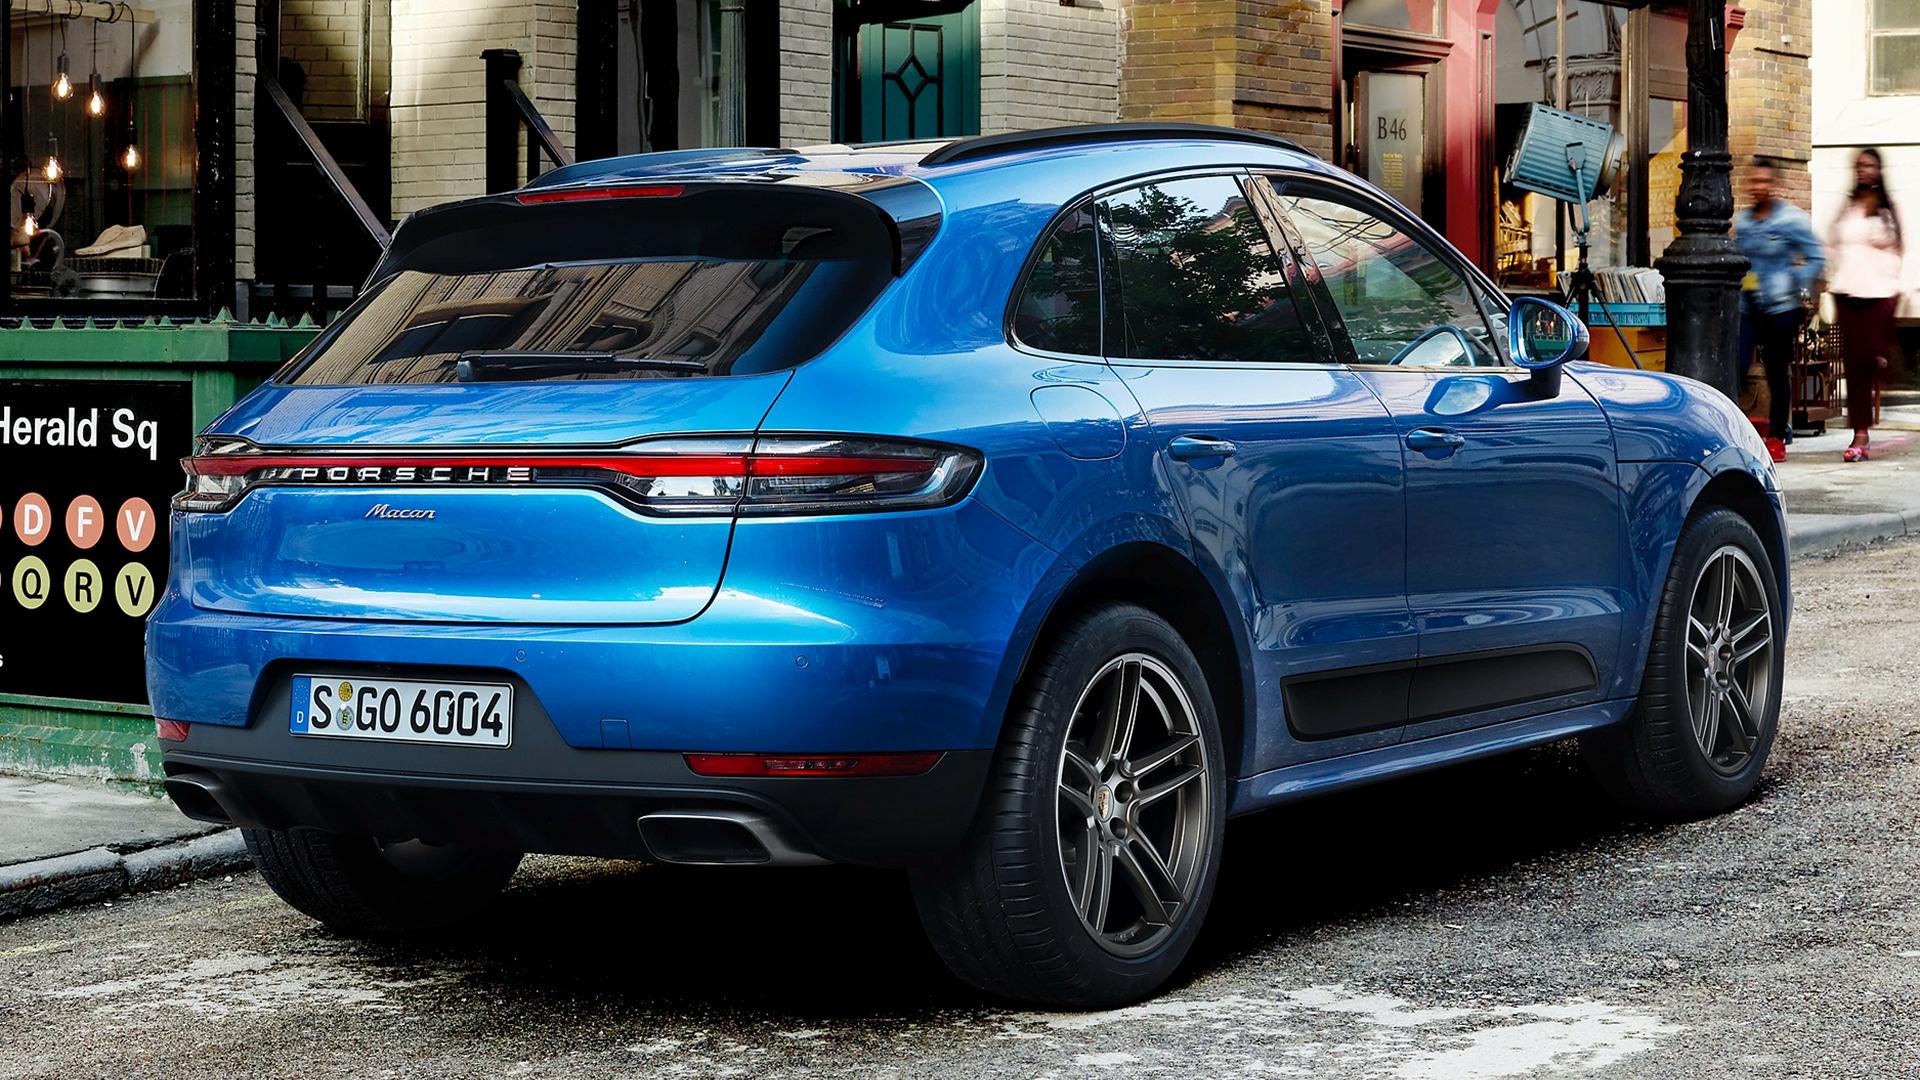 Porsche Macan 2018 Wallpapers And Hd Images Car Pixel